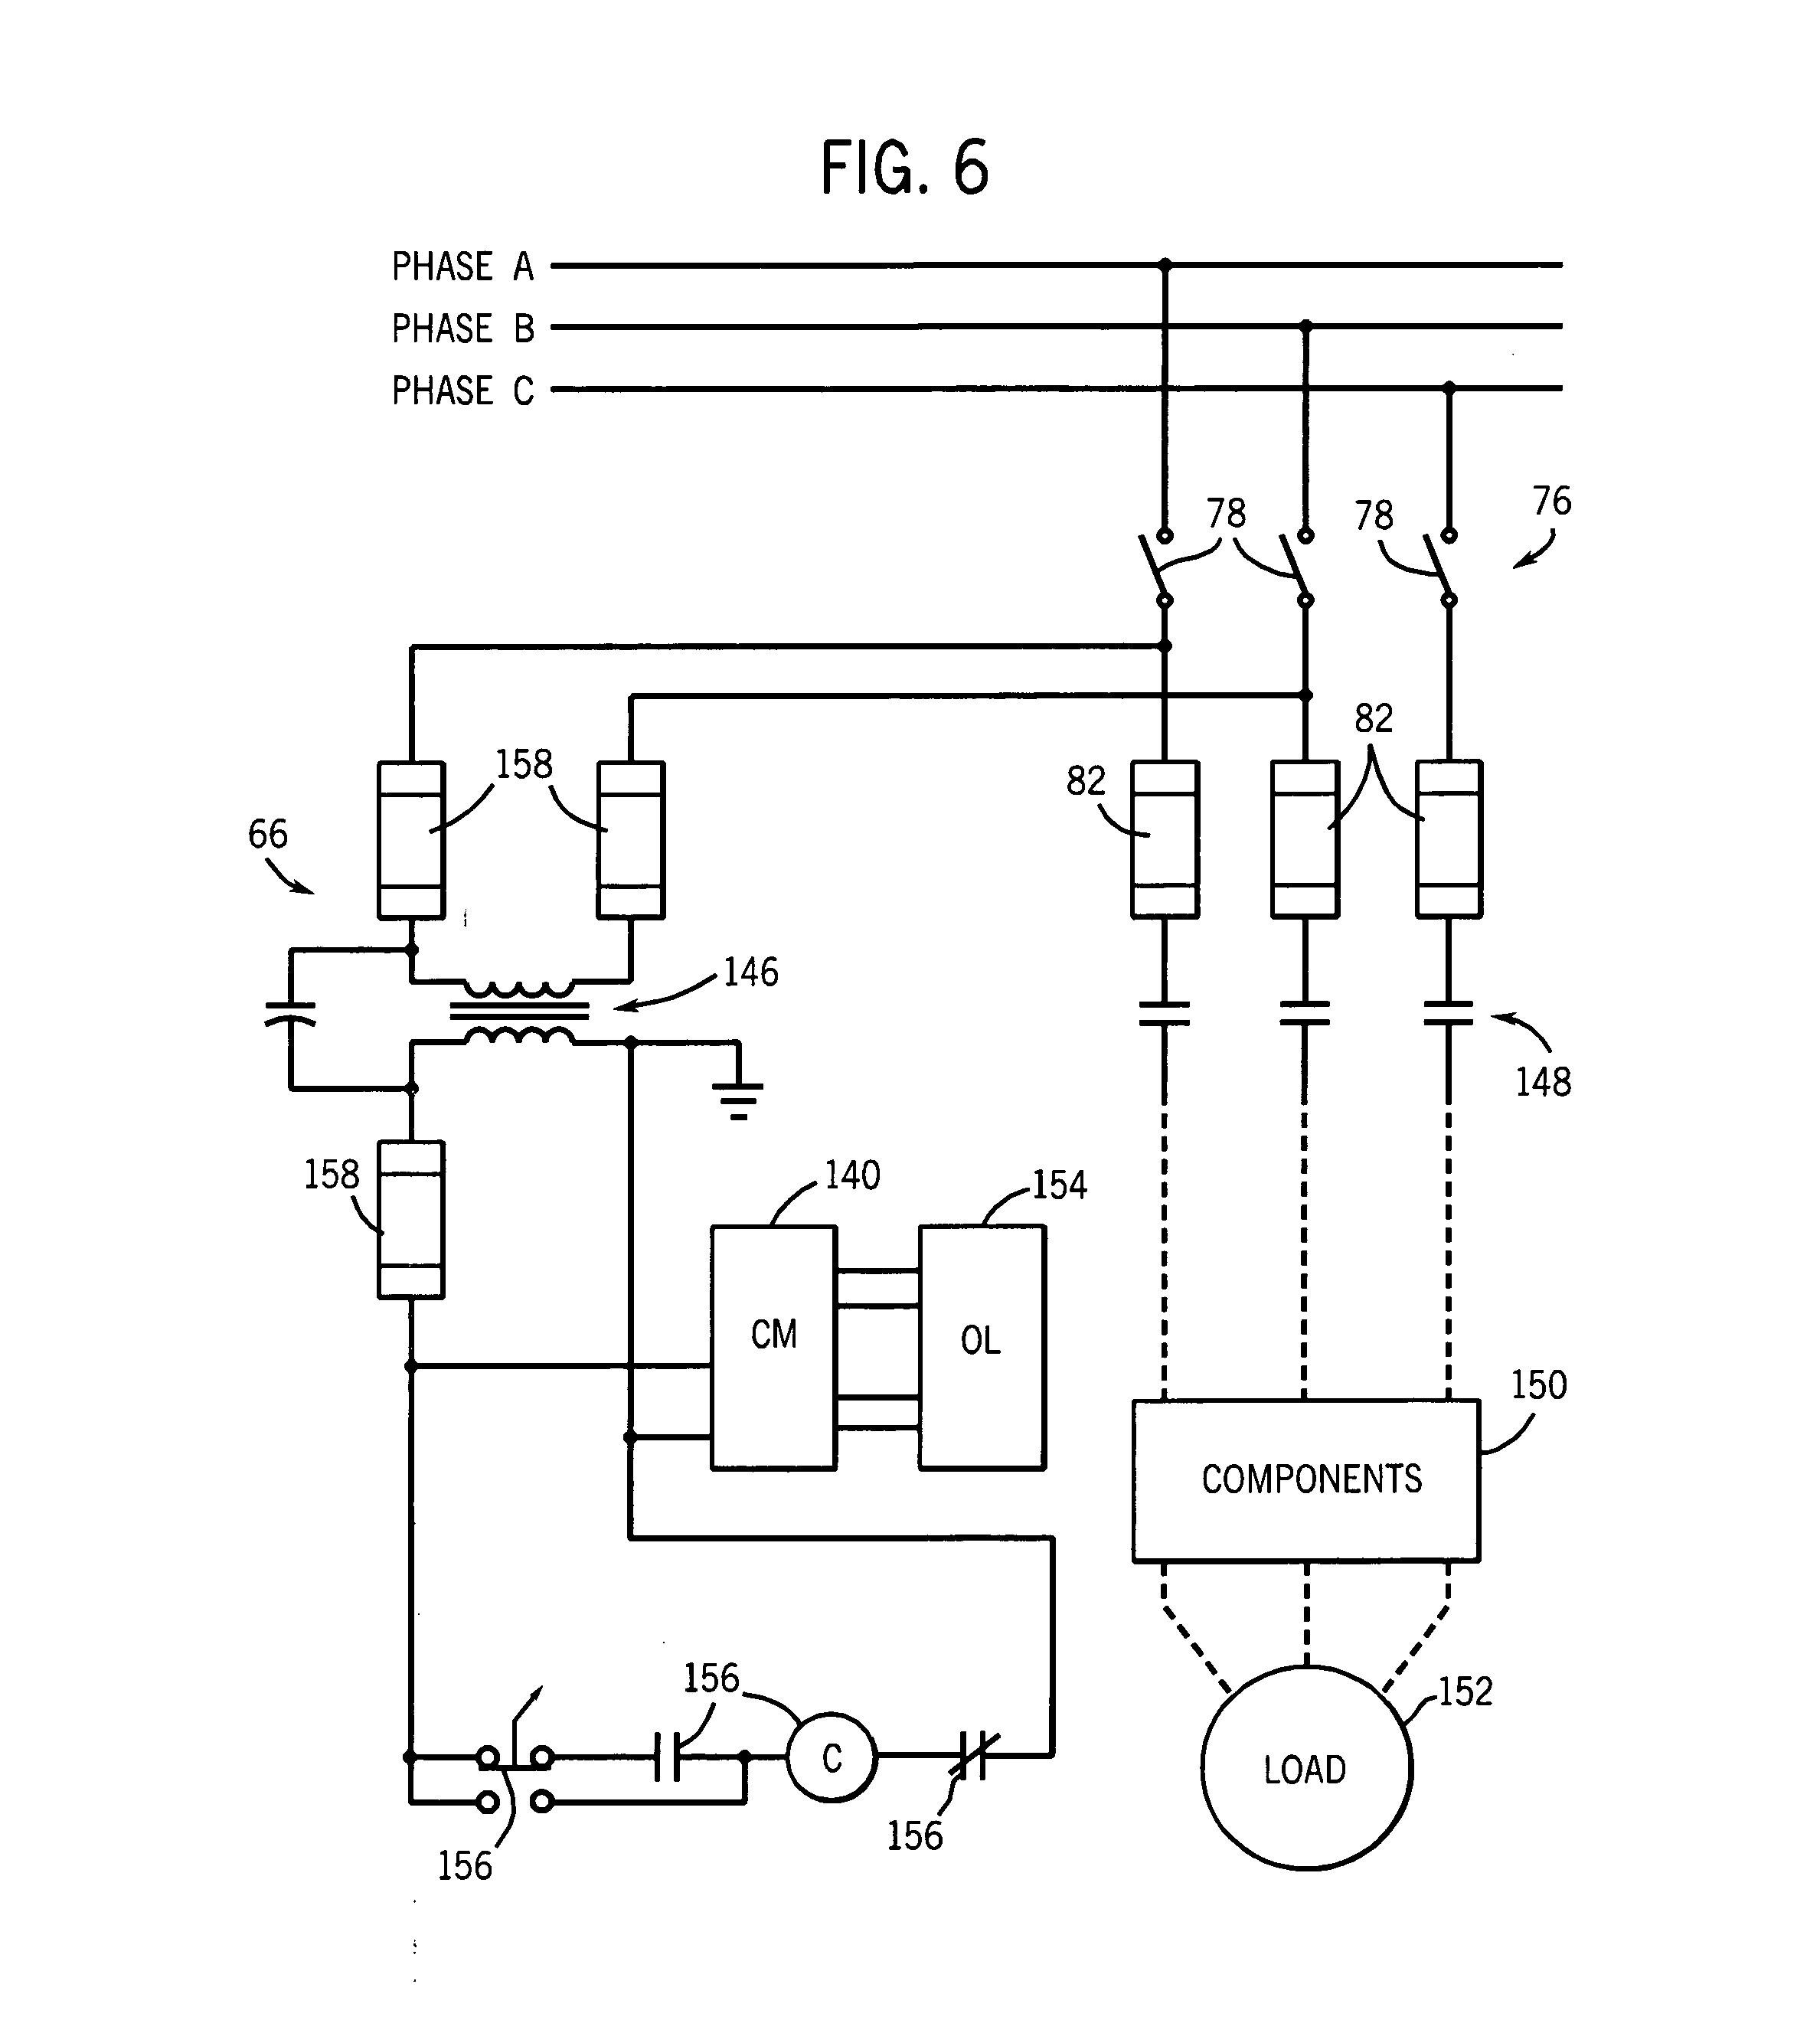 start stop parallel wiring diagram simple start stop wiring Push Button Wiring-Diagram medium resolution of start stop wiring diagram emergency stop push button wiring diagram fresh wiring diagram